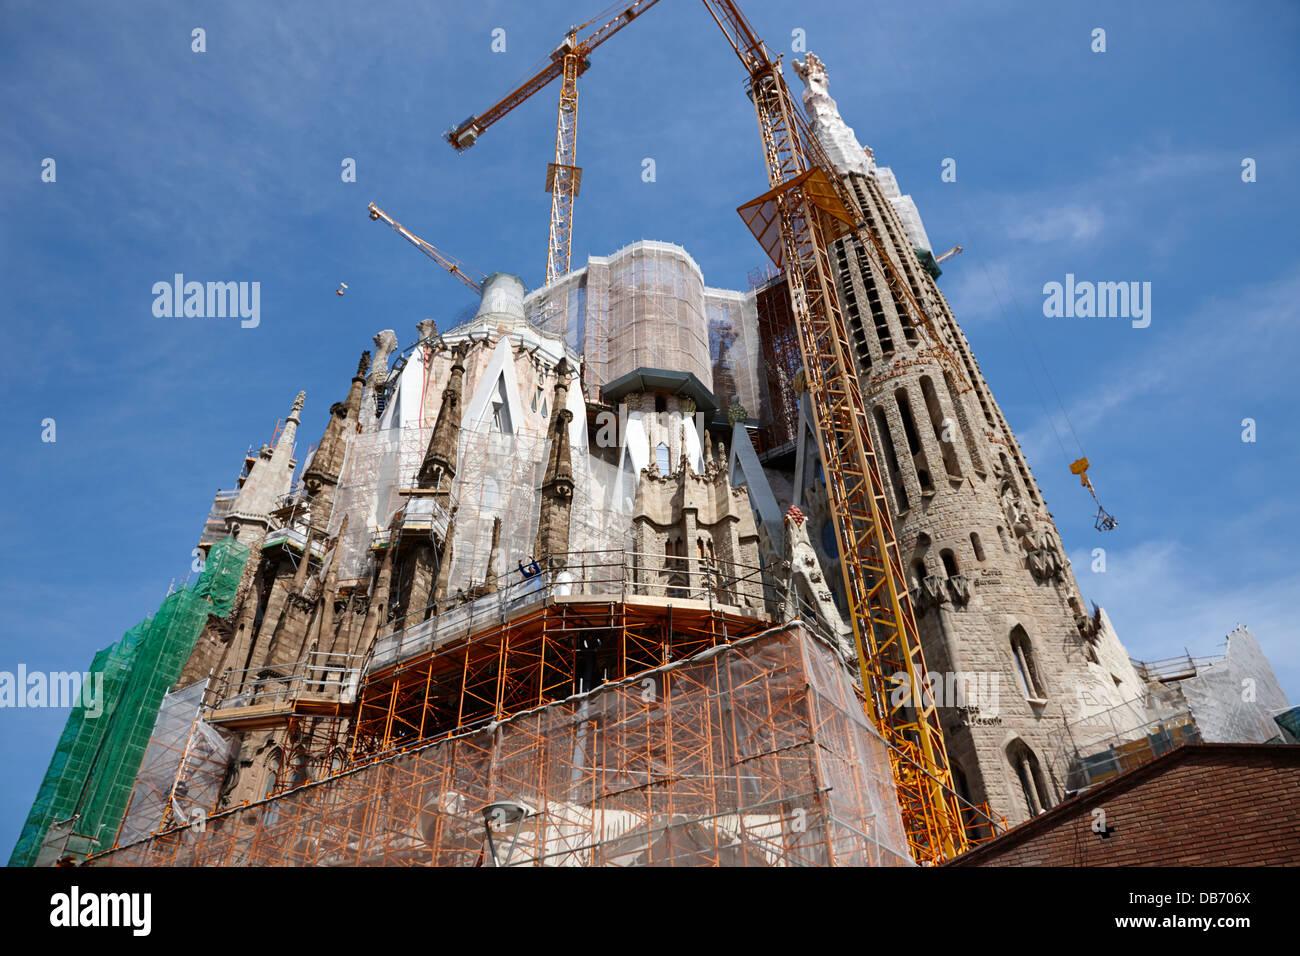 scaffolding and cranes above Sagrada Familia Barcelona Catalonia Spain - Stock Image